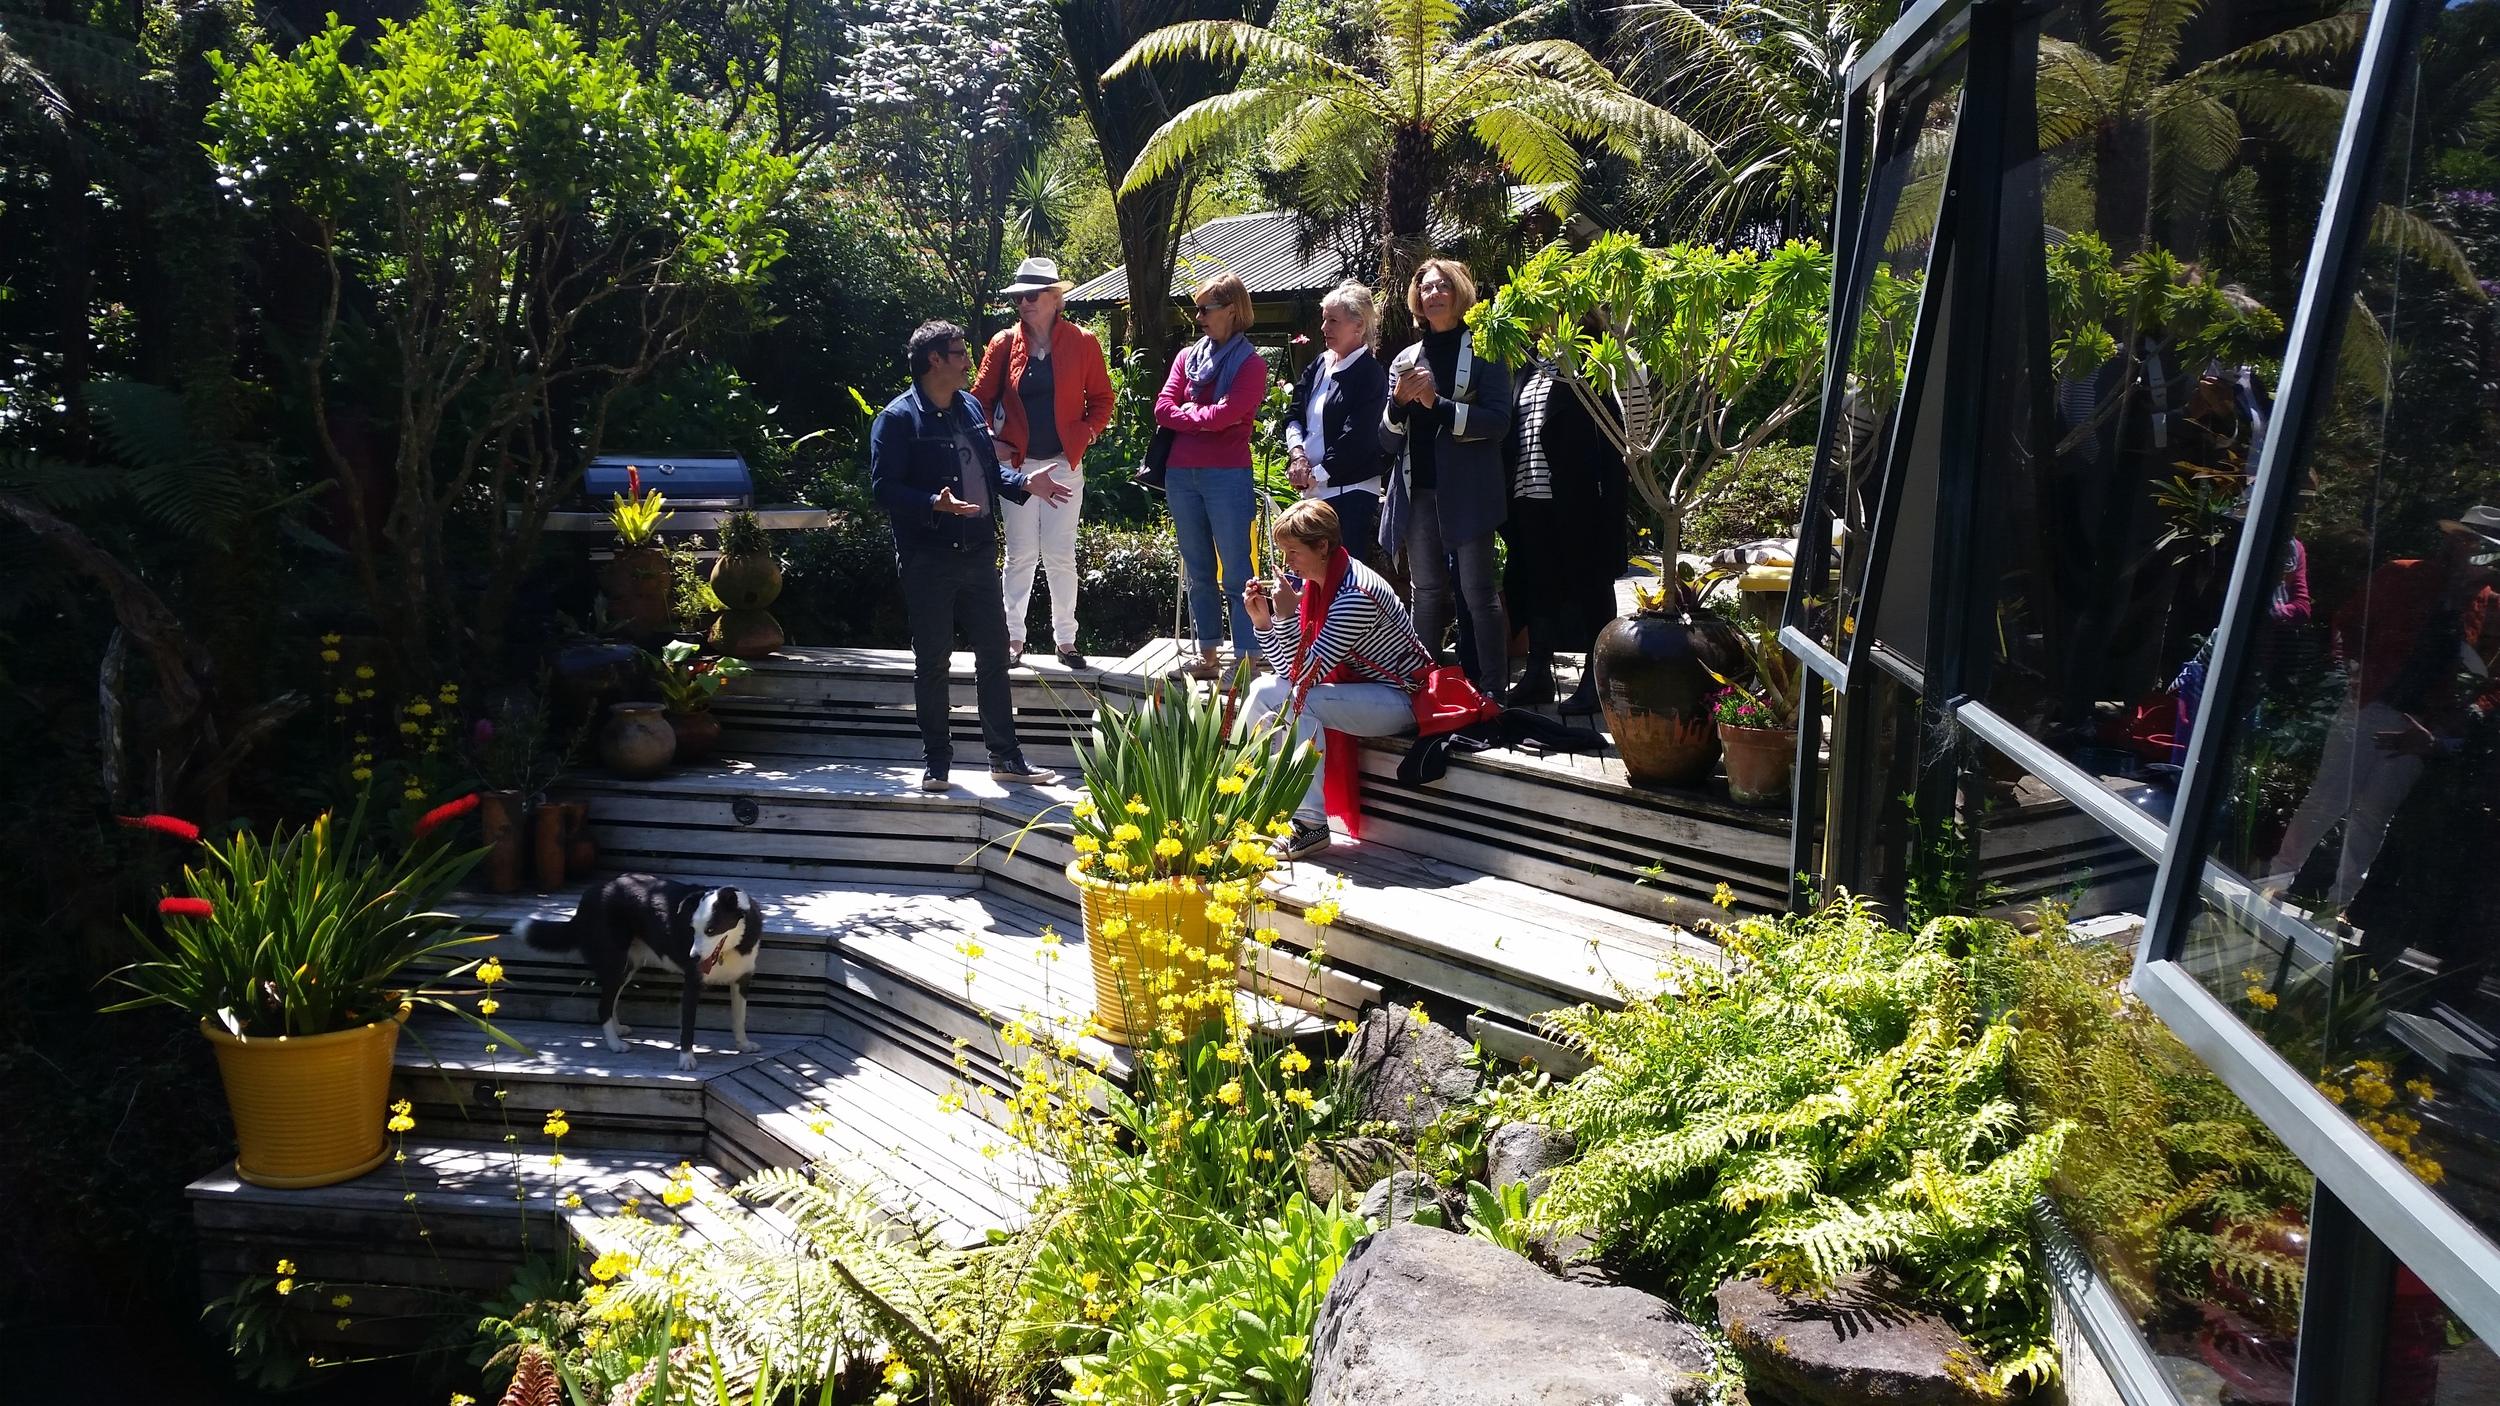 Reuben Paterson at home with Et Alia art group